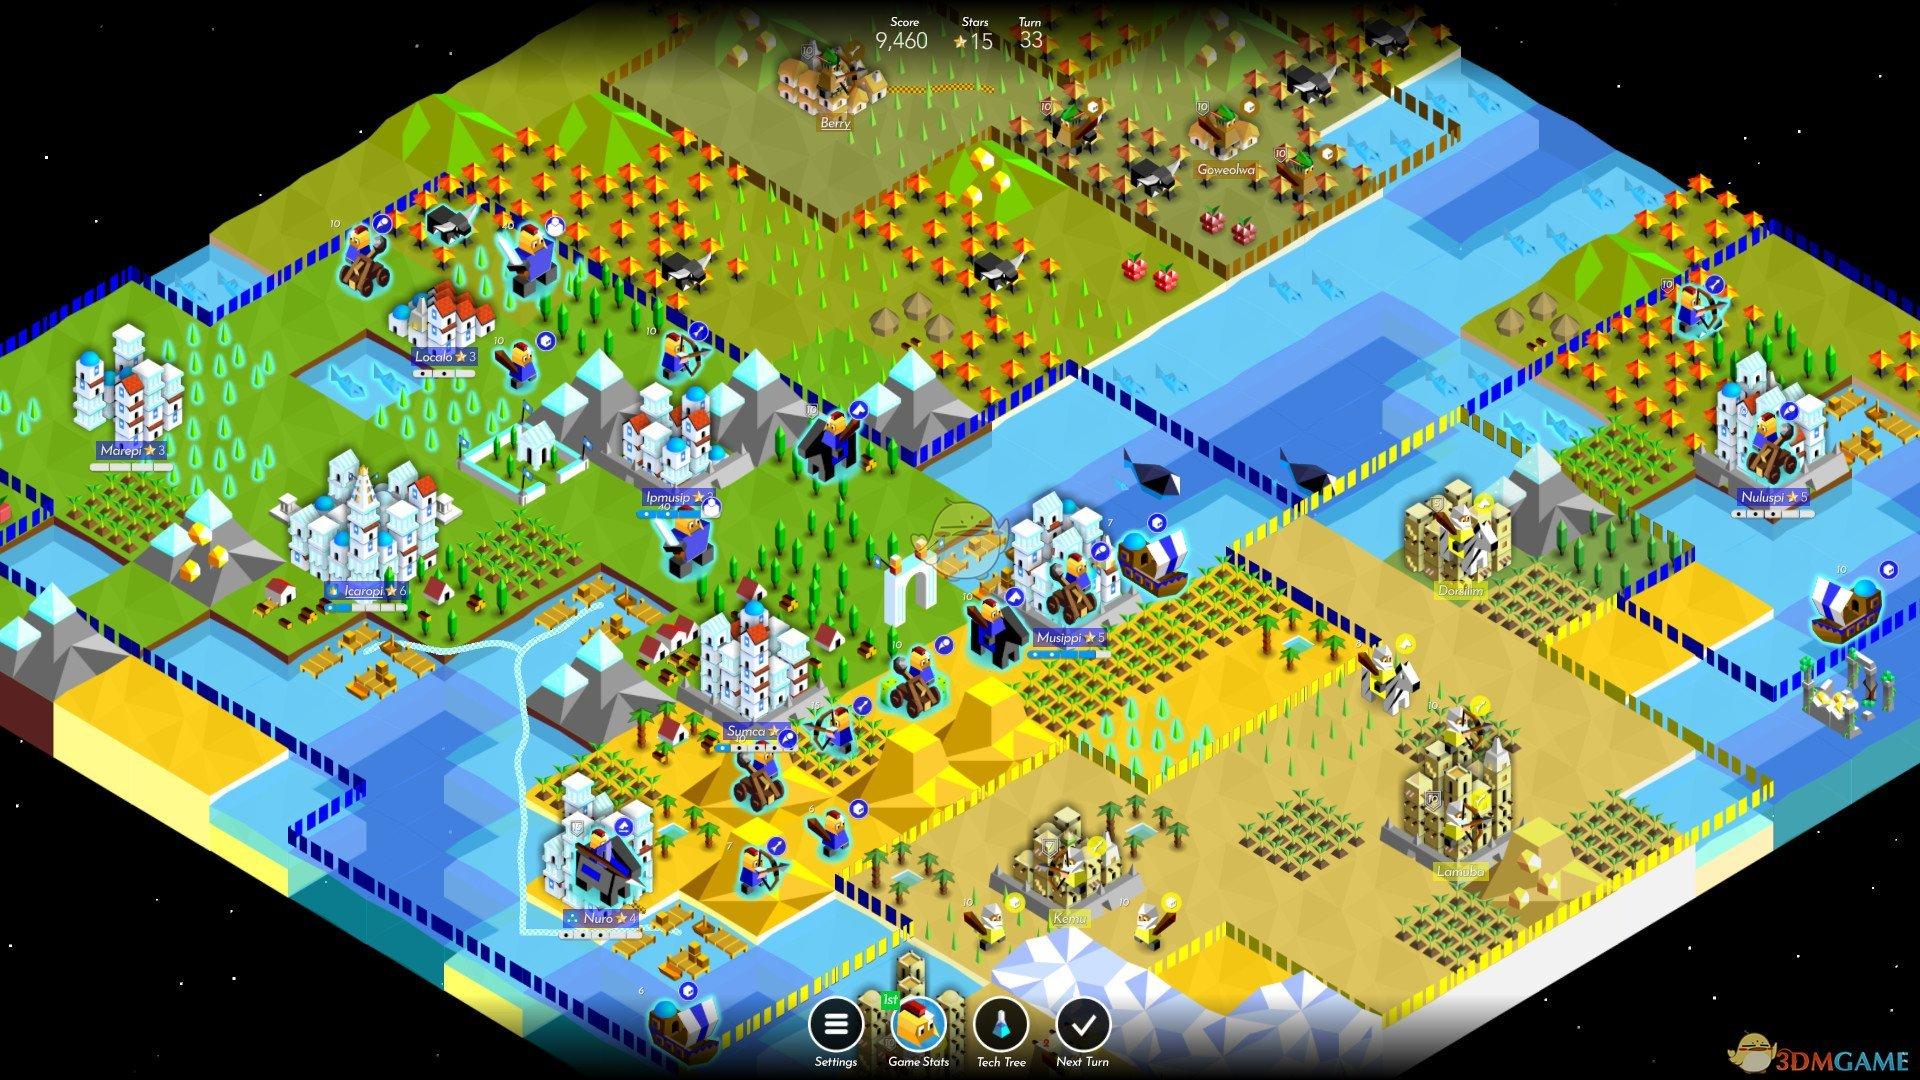 《The Battle of Polytopia》游戏特色内容一览